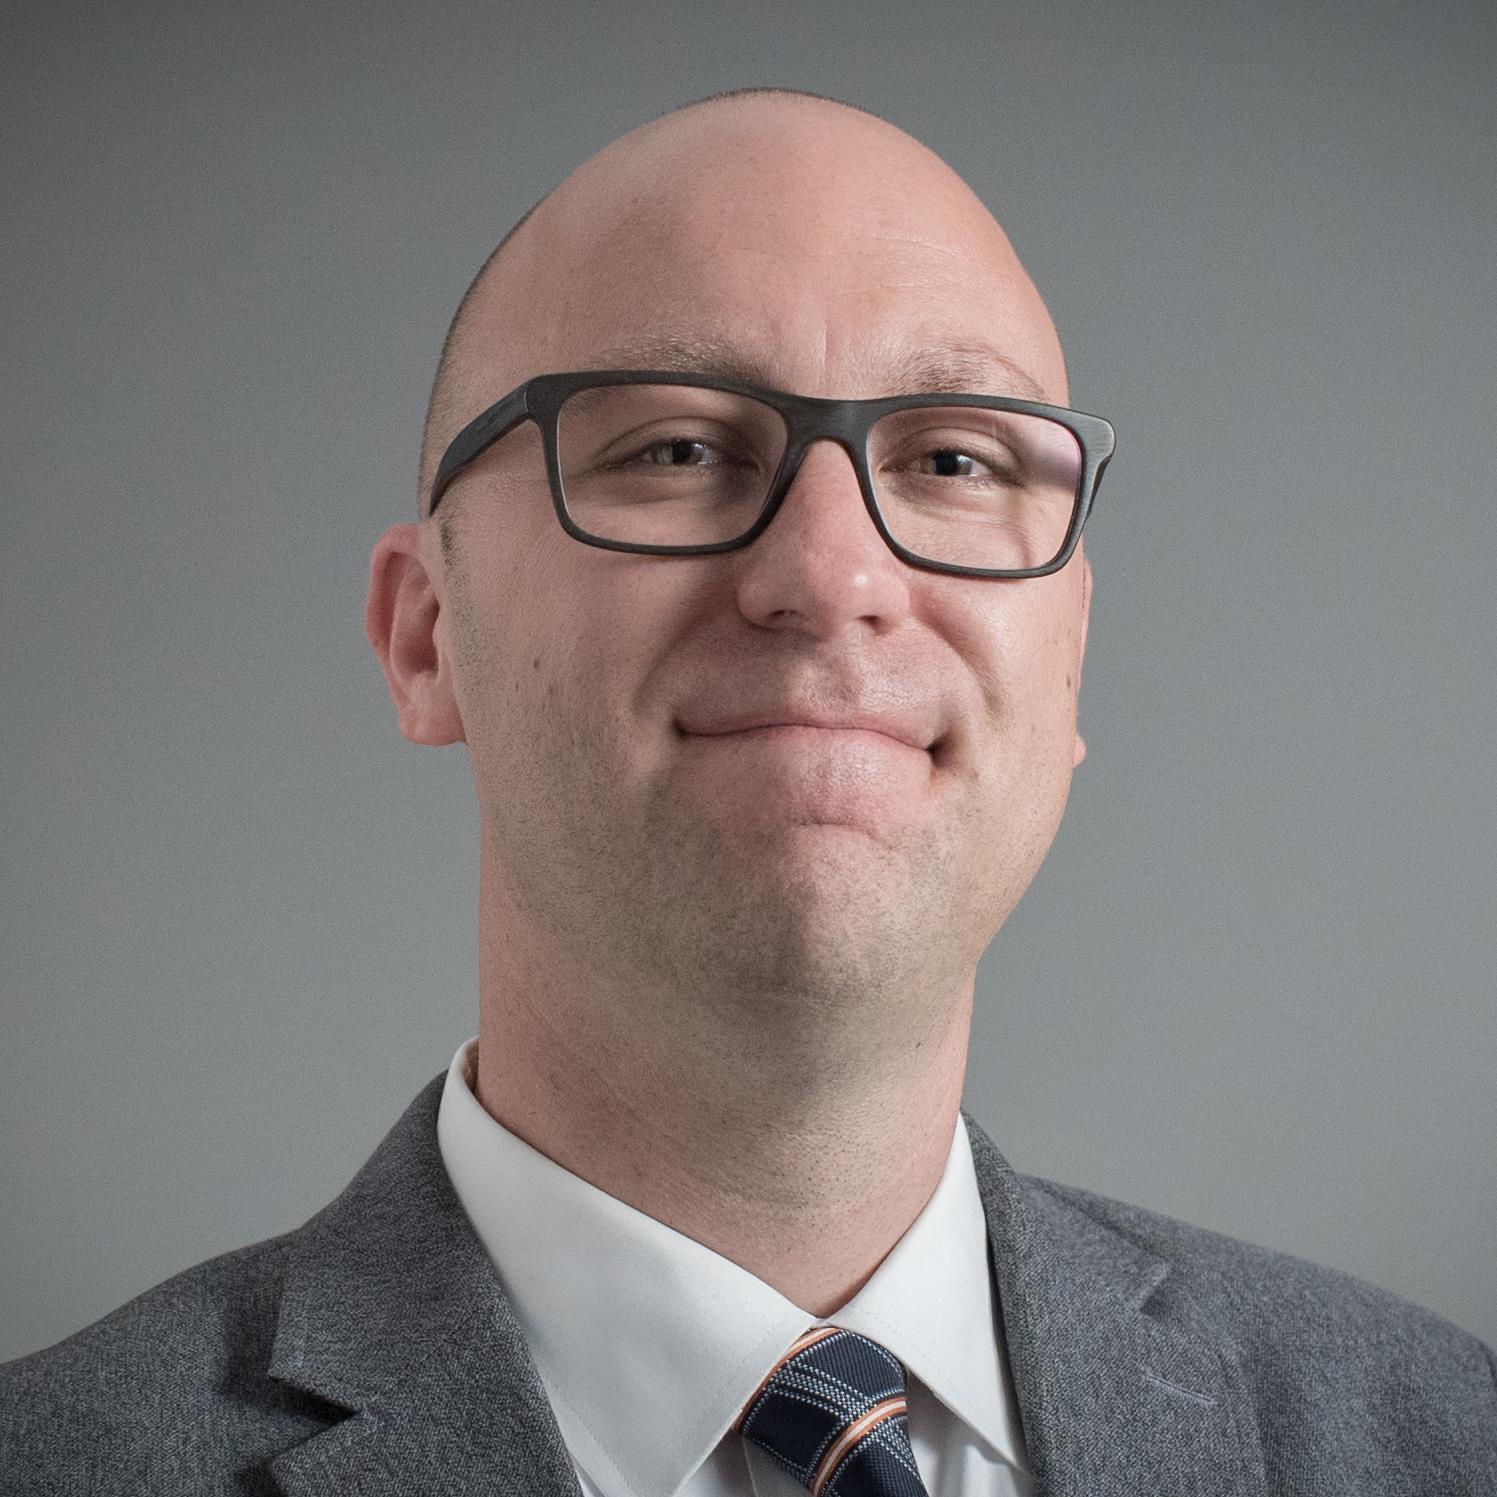 Todd Tomalak HIRI Headshot.jpg